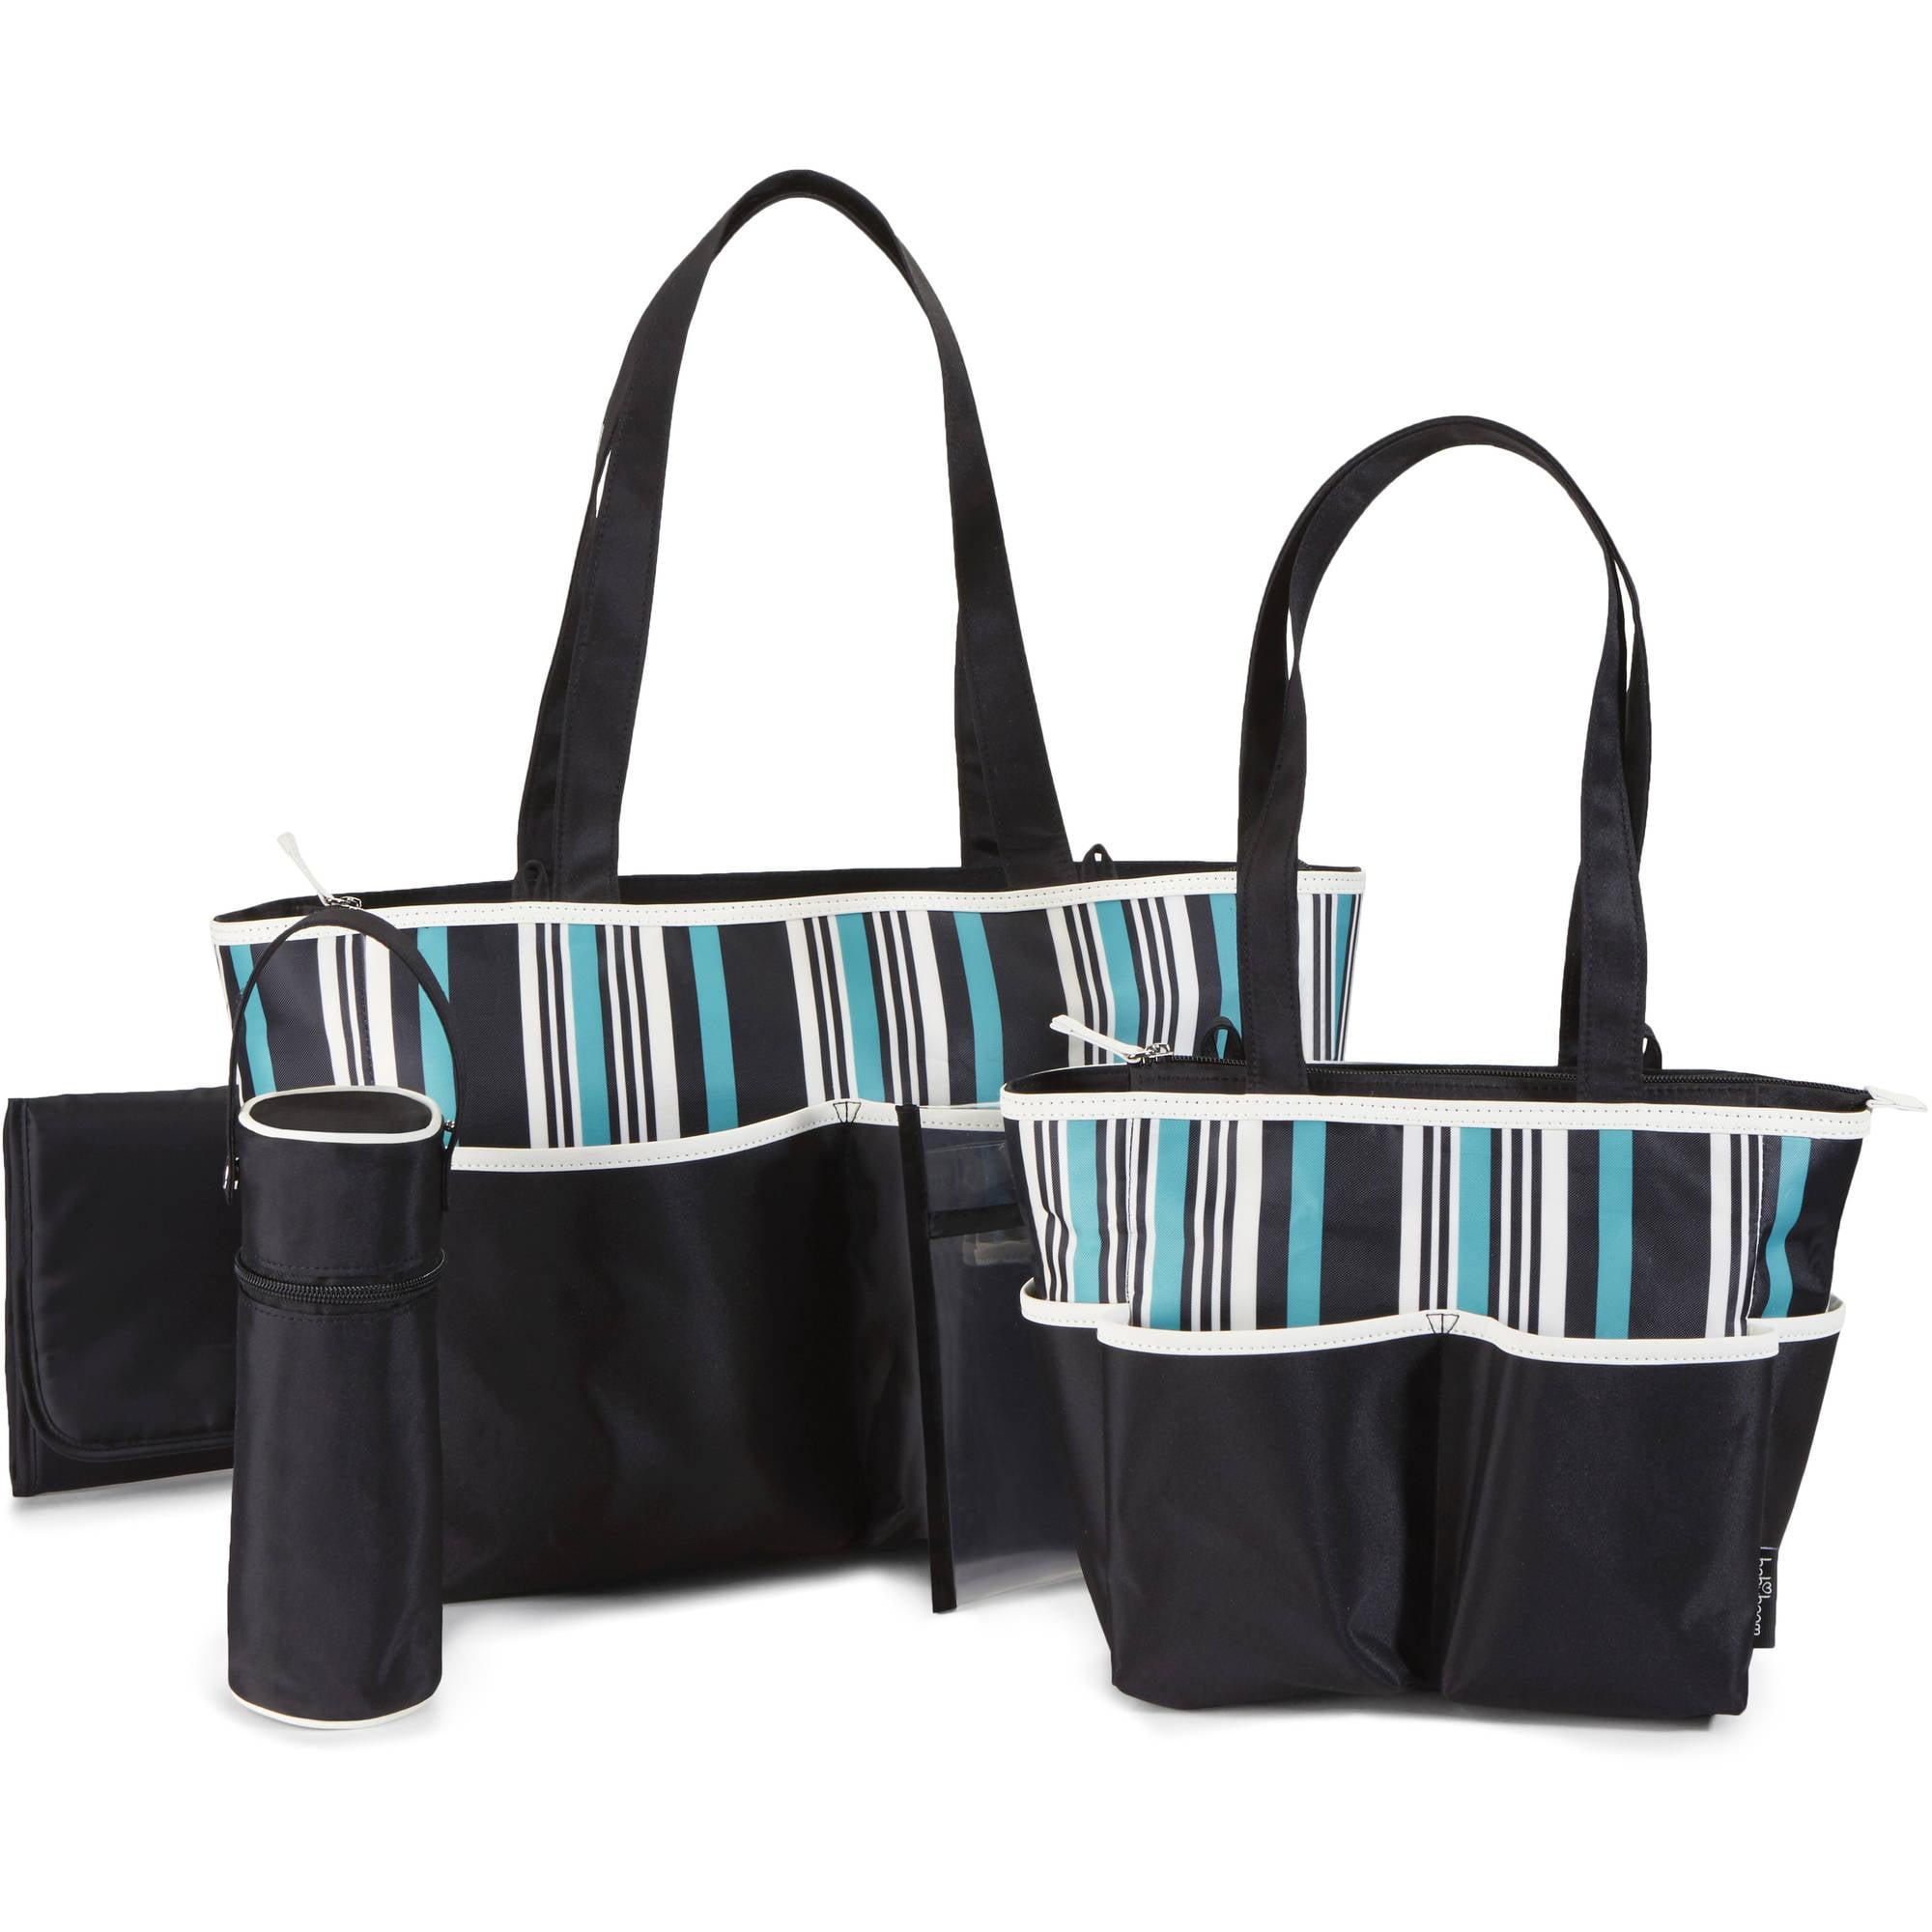 Baby Boom Tote Diaper Bag 5pc set, Striped